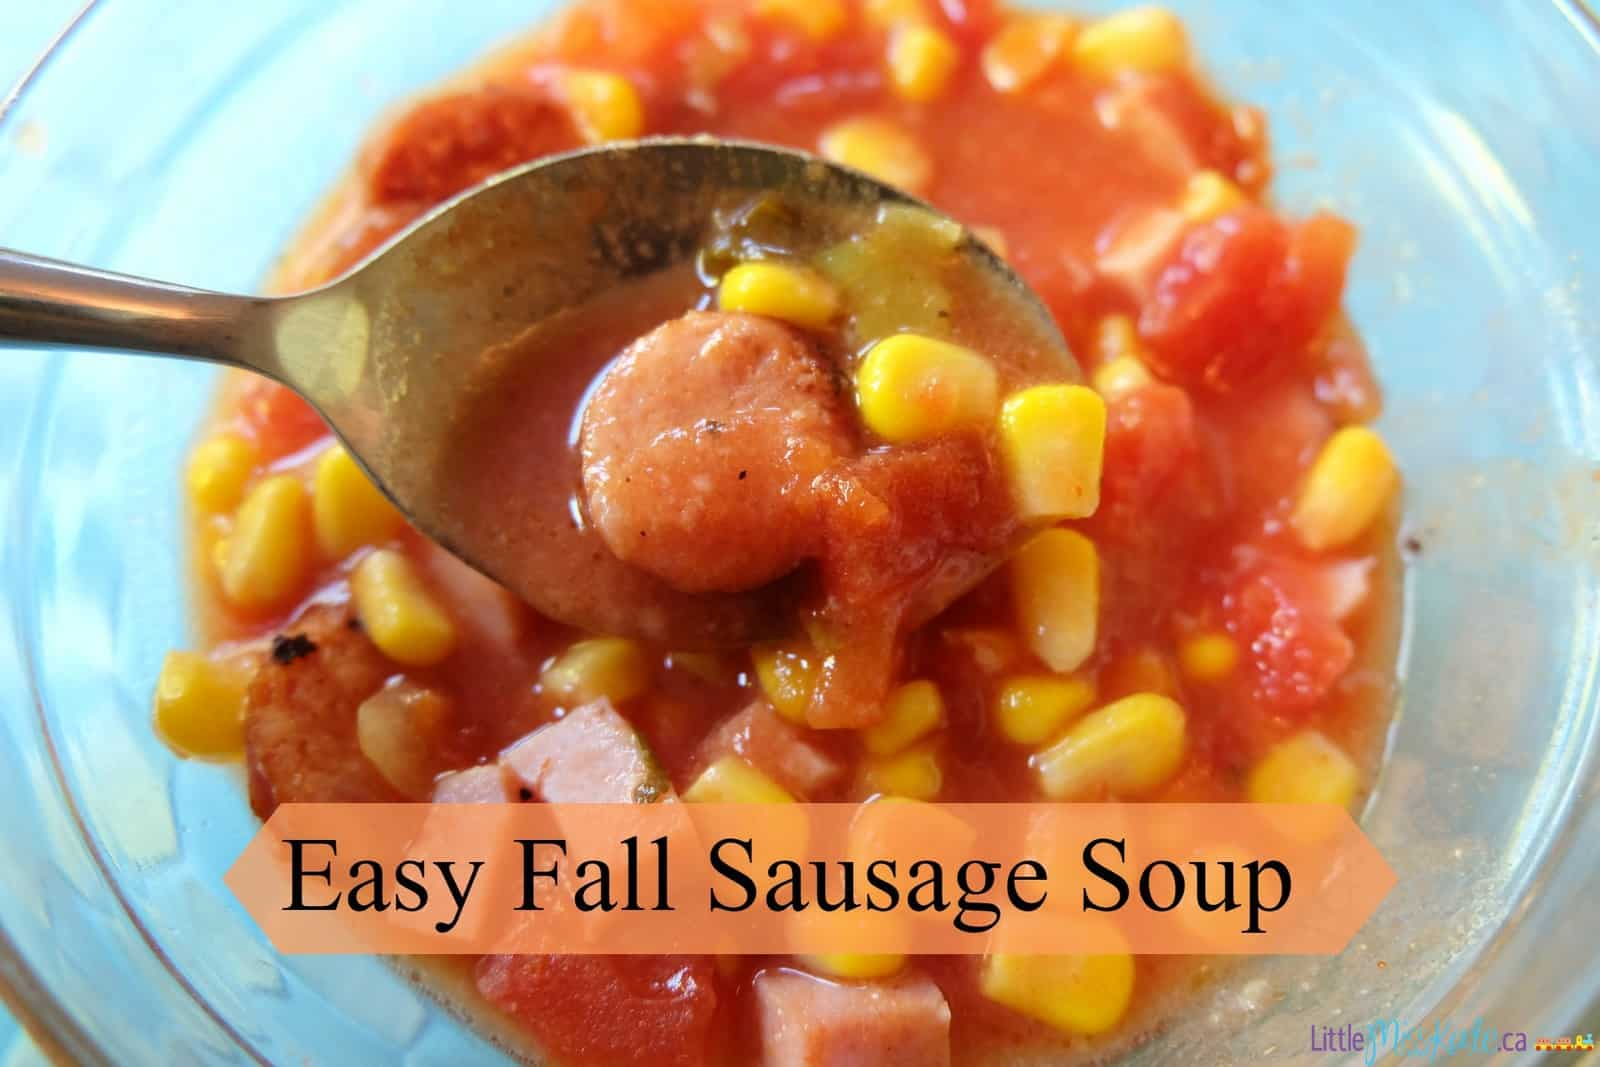 Easy Fall Sausage Soup